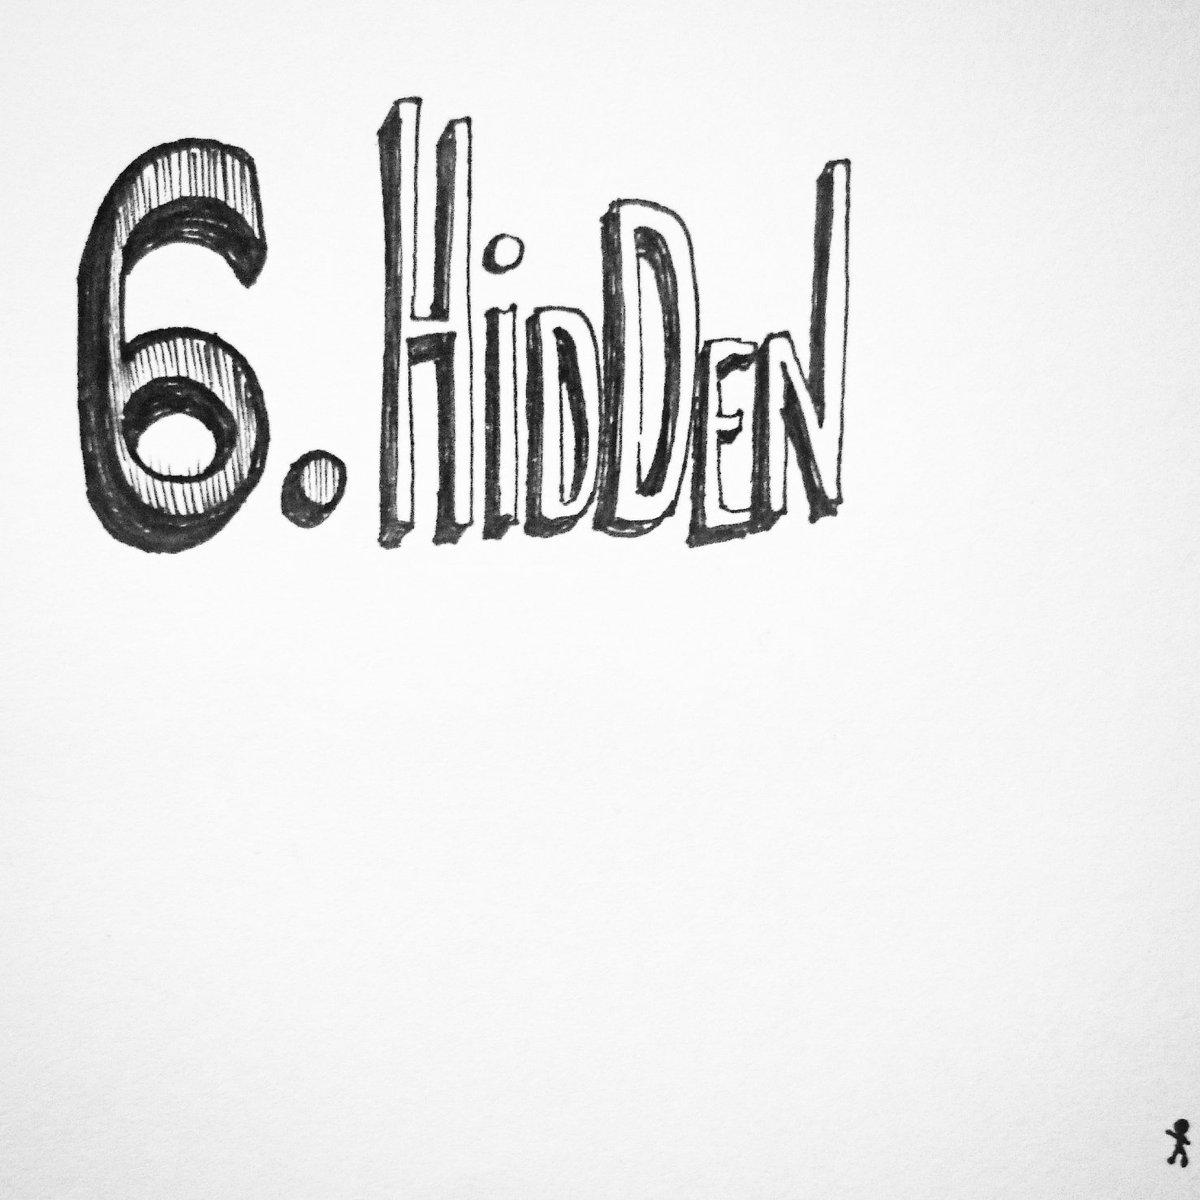 Day 6: Hidden